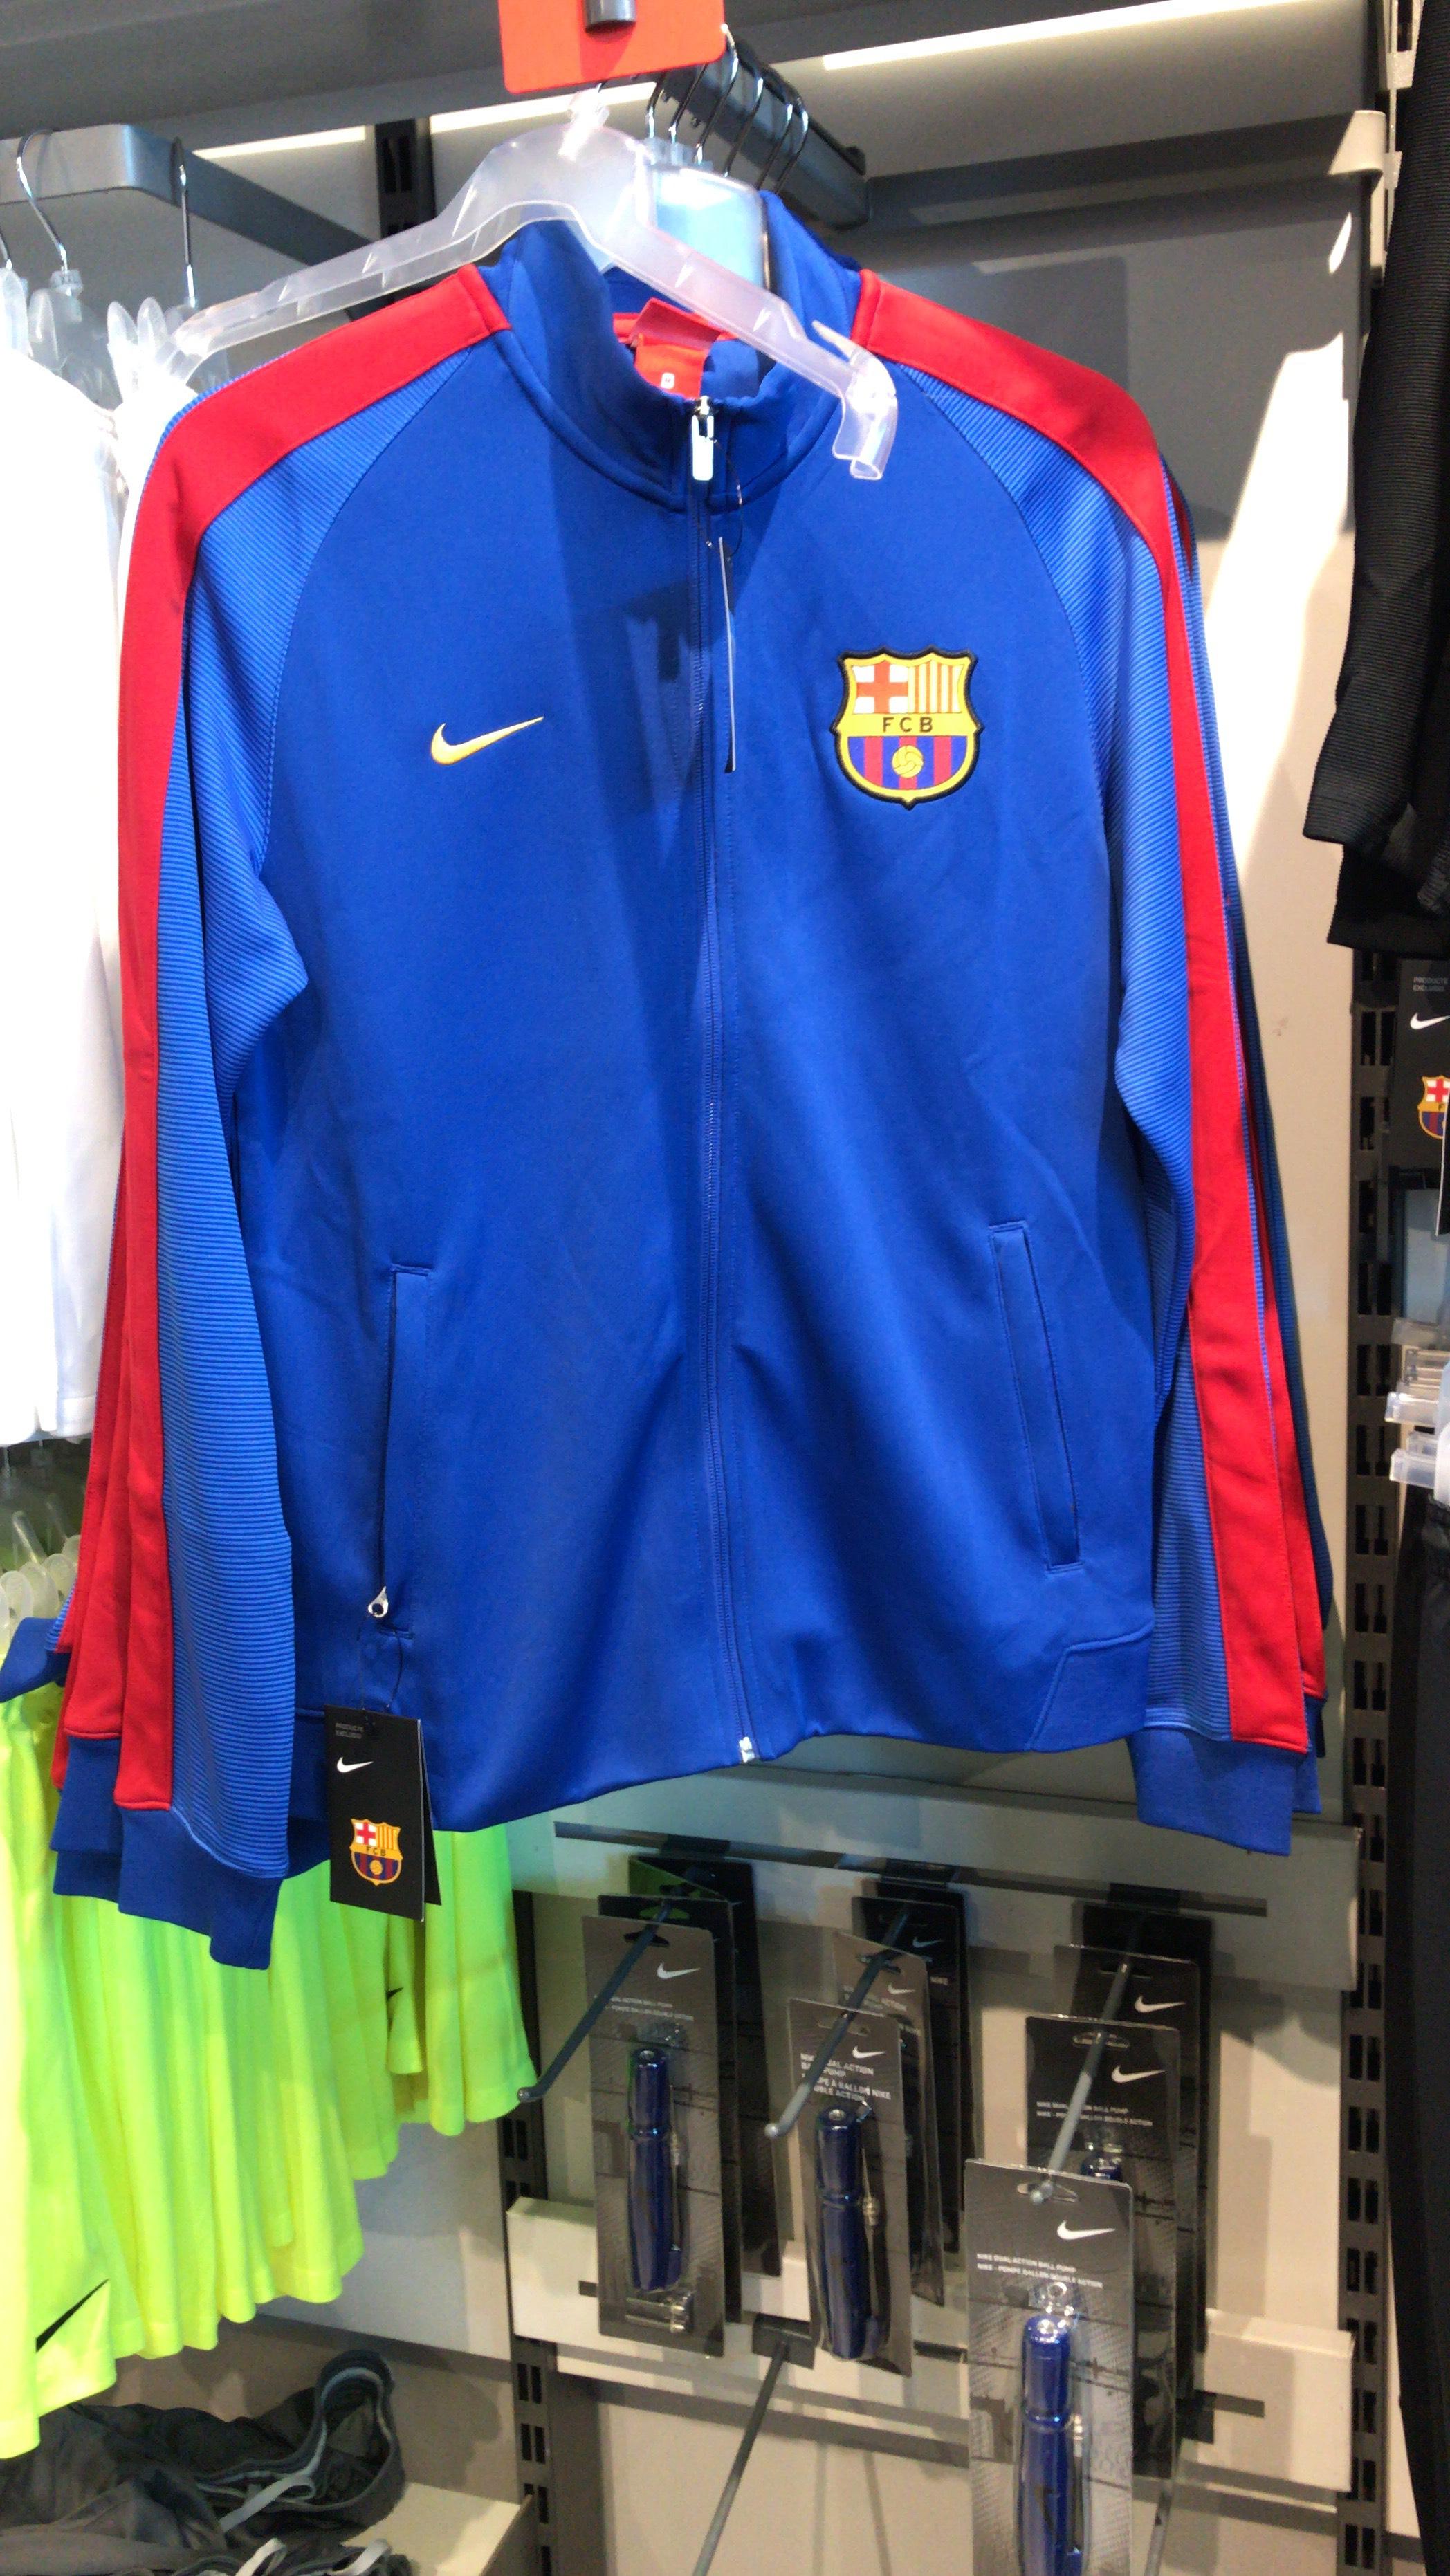 Nike Barcelona Top - £12.60 instore @ Nike Outlet (Thurrock)